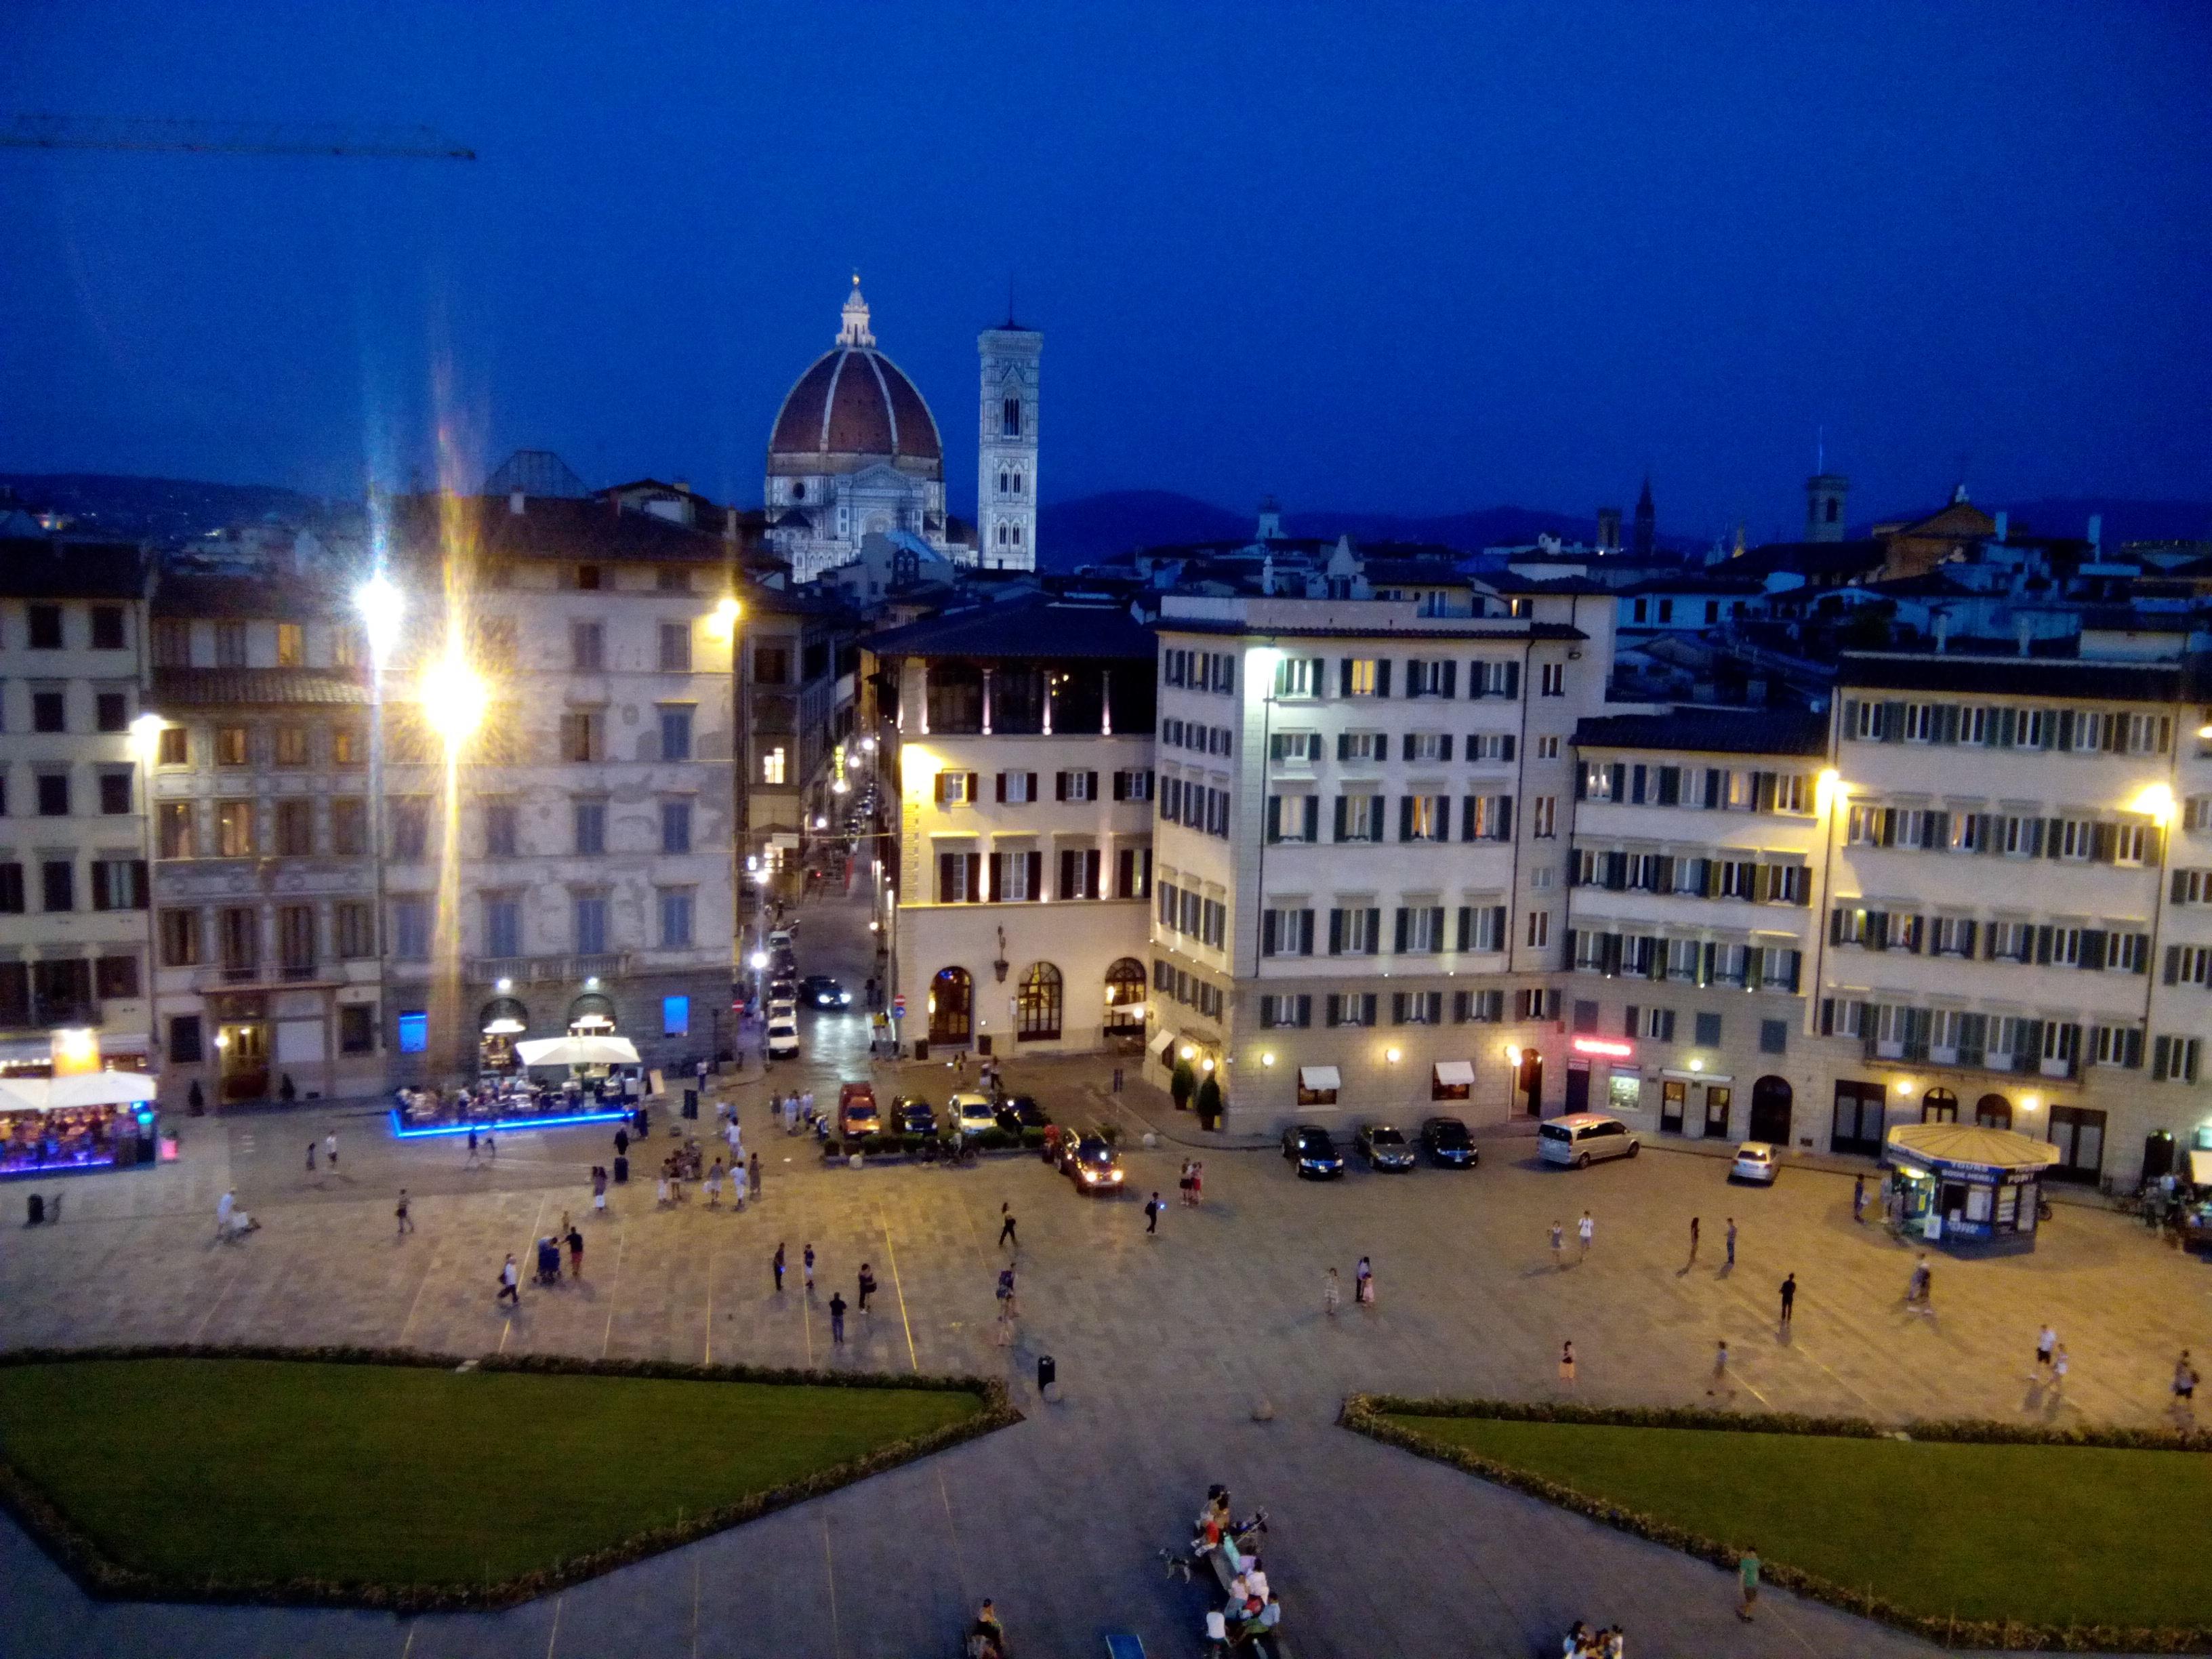 Florence: Santa Maria Novella Square